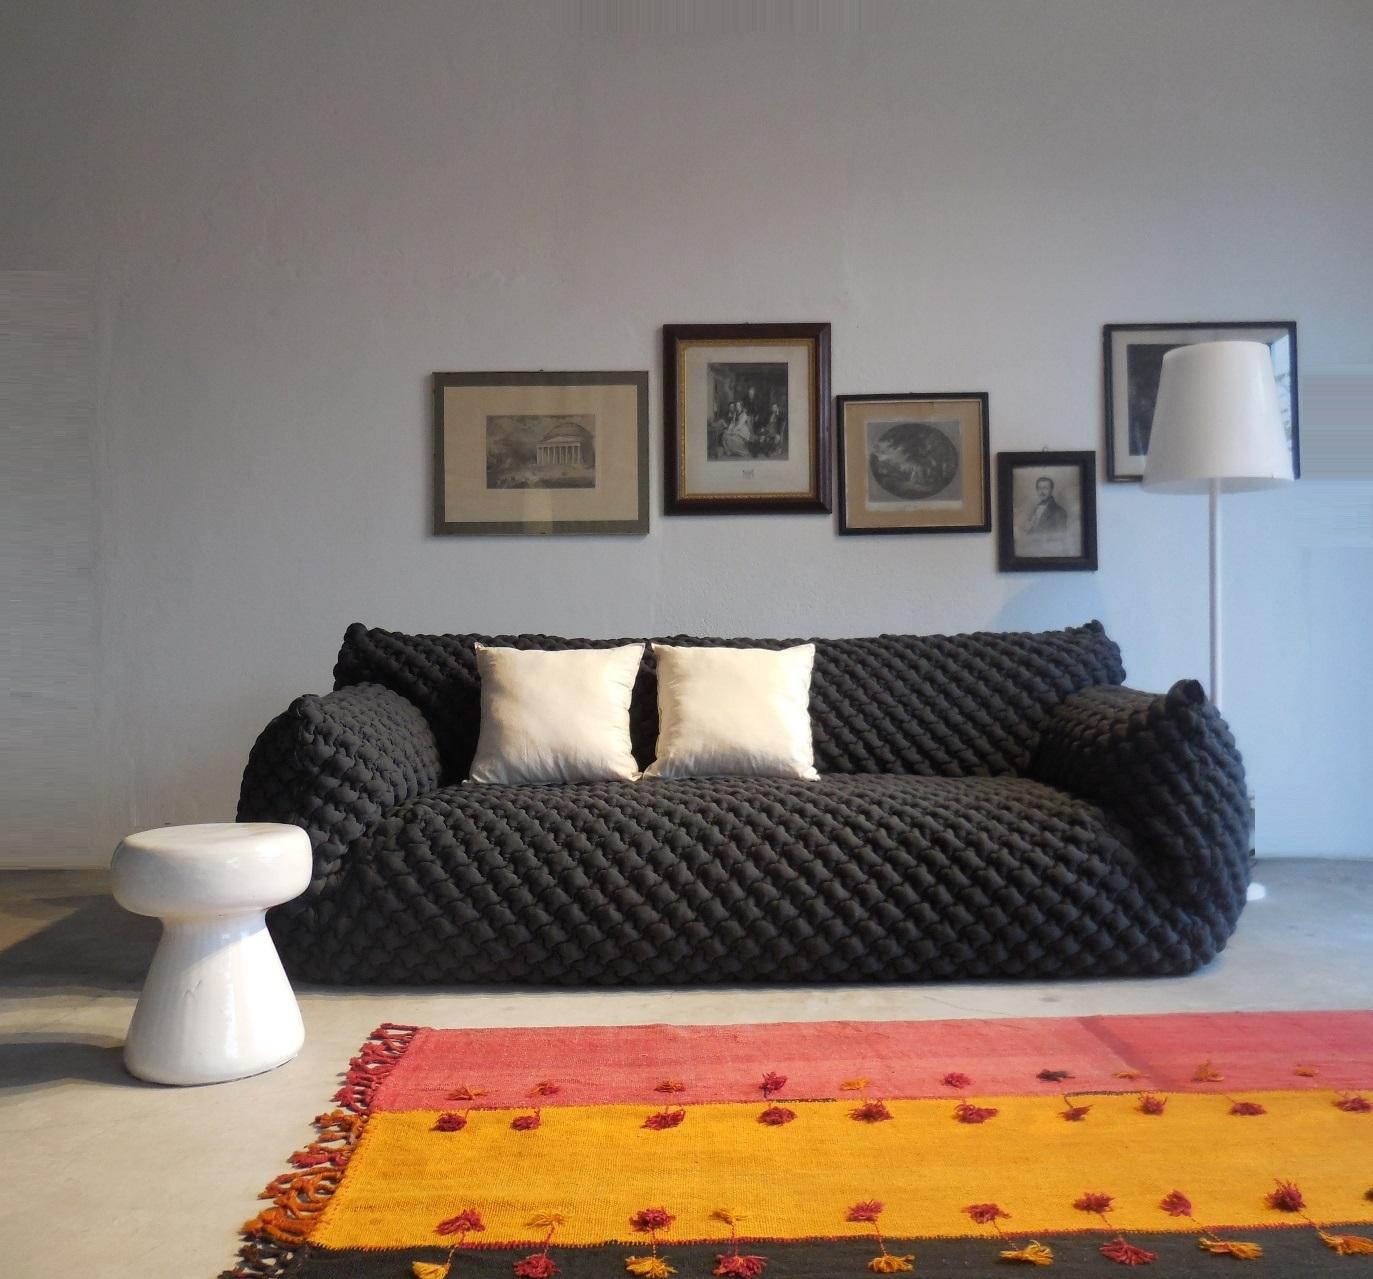 Vendita divani online fabulous divani economici vendita for Vendita online divani